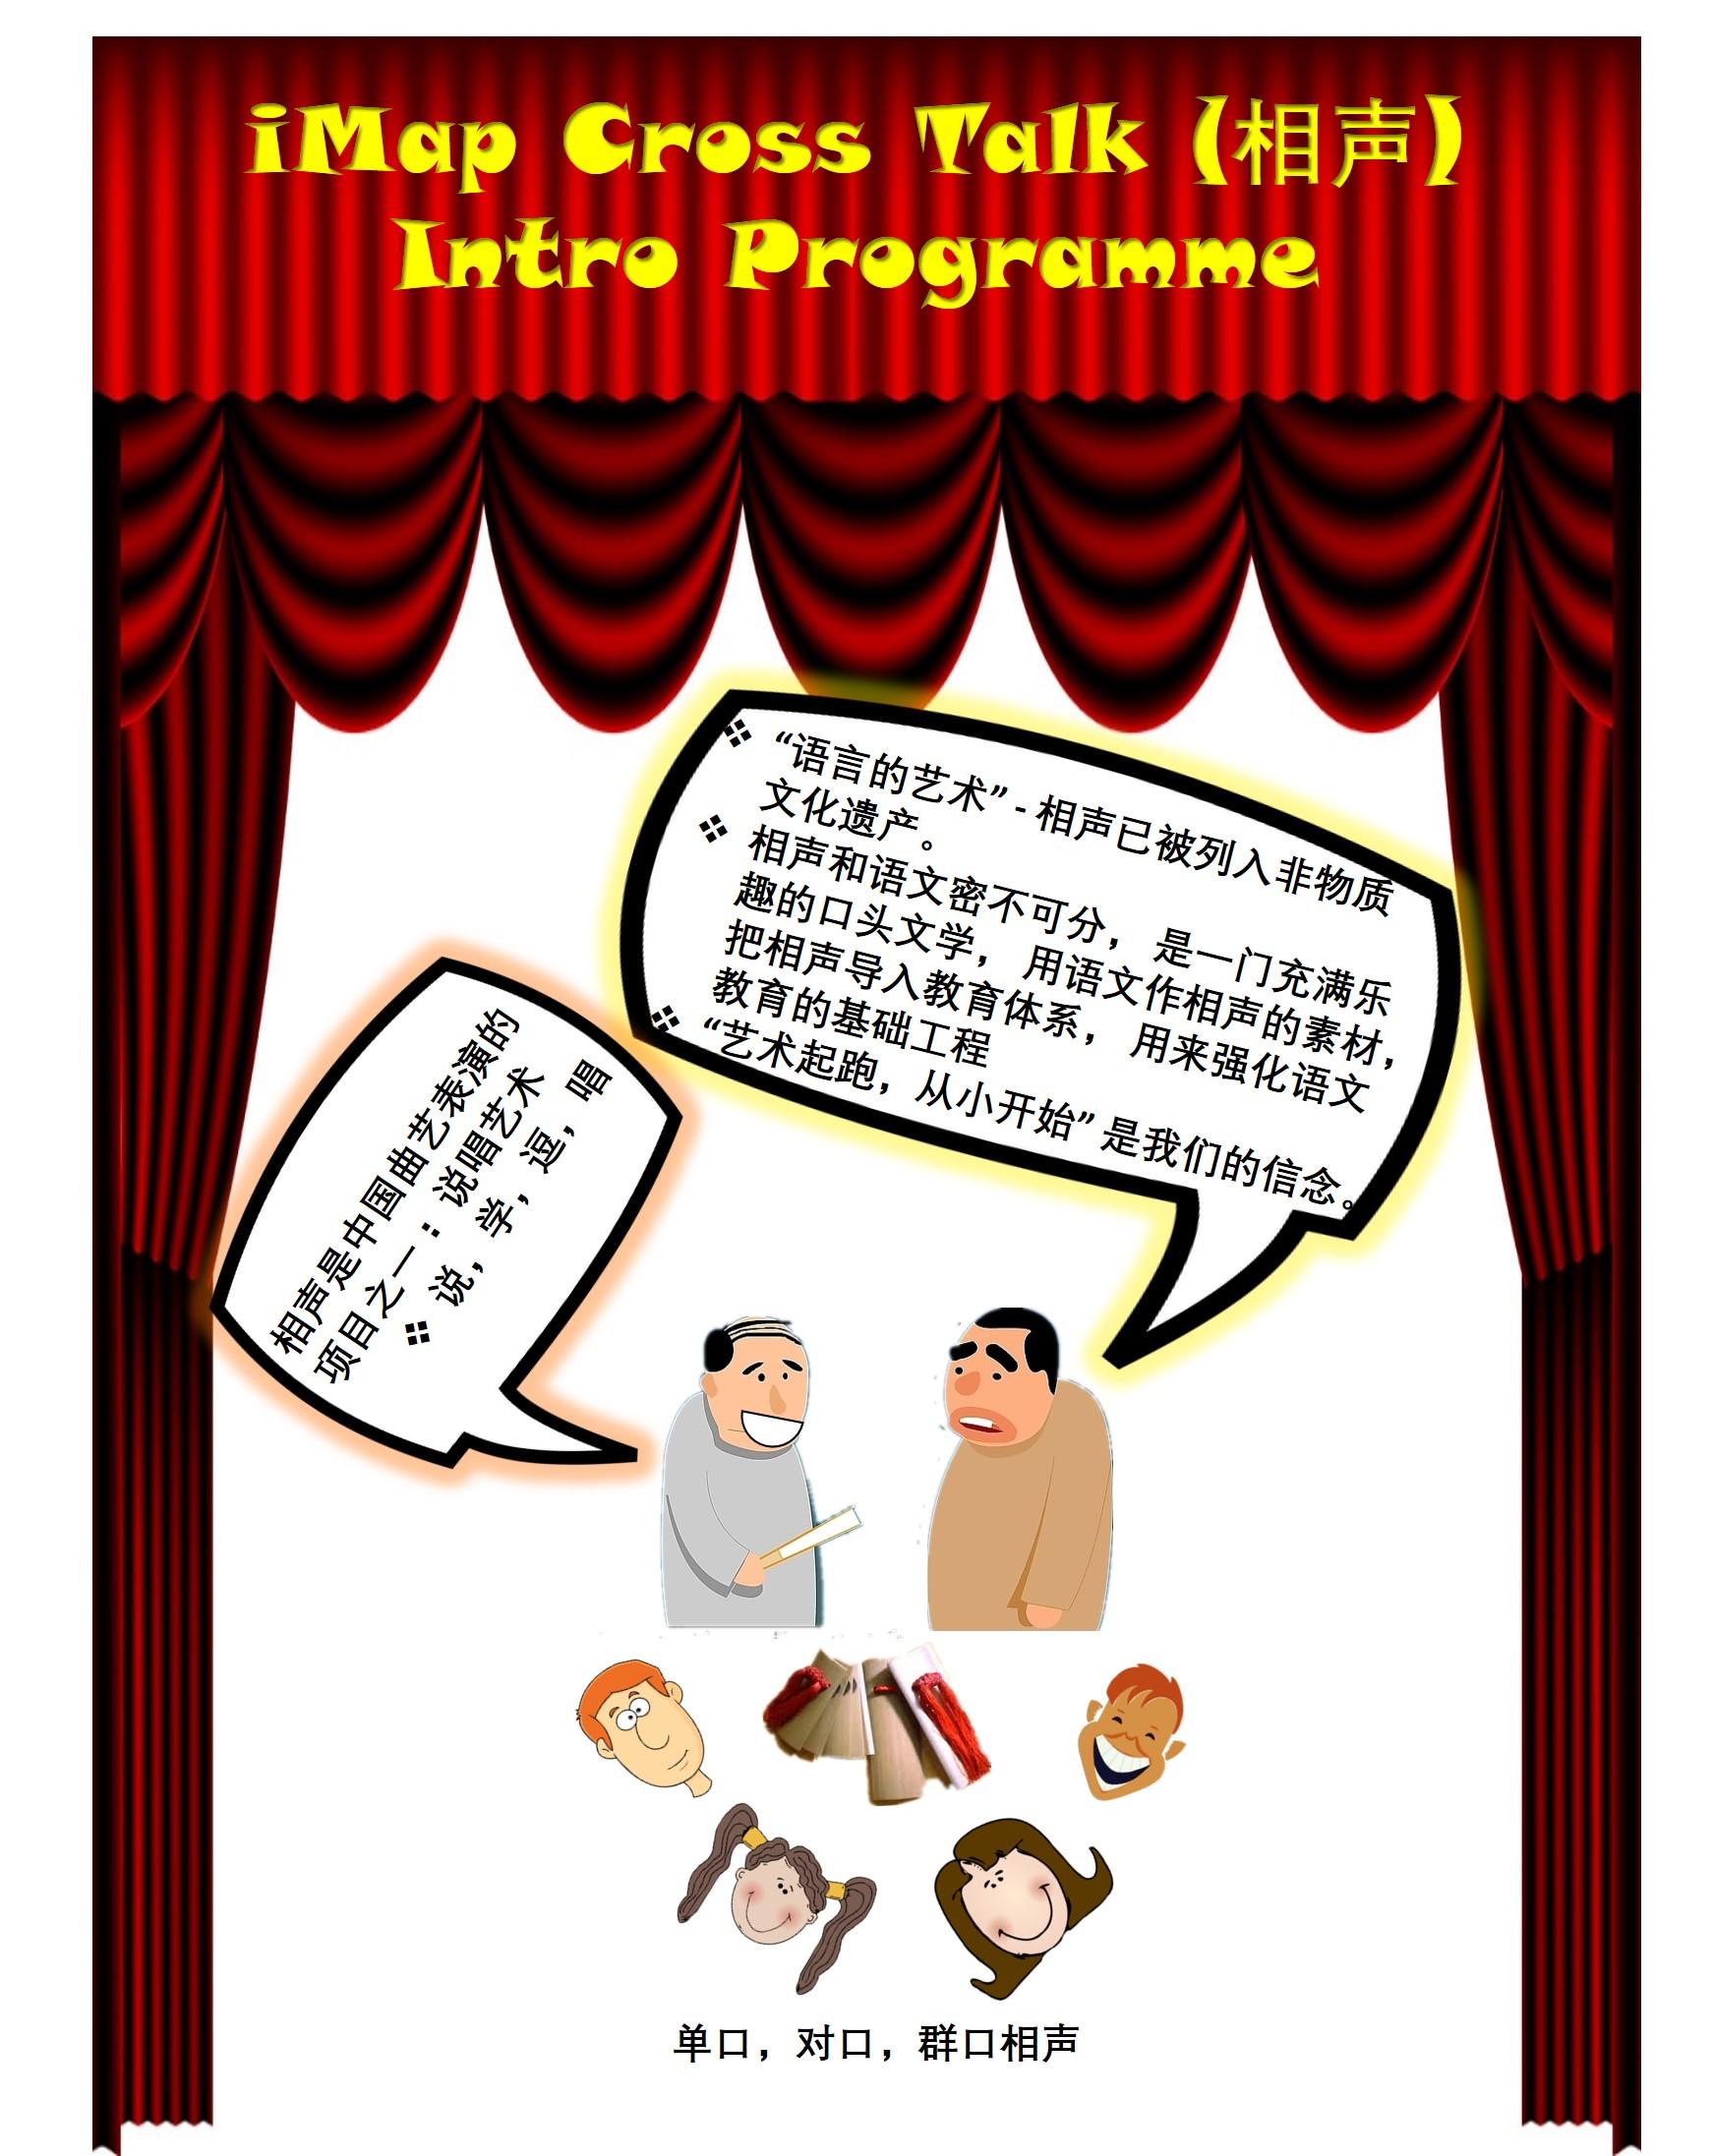 iMap Cross Talk (相声) Intro Programme